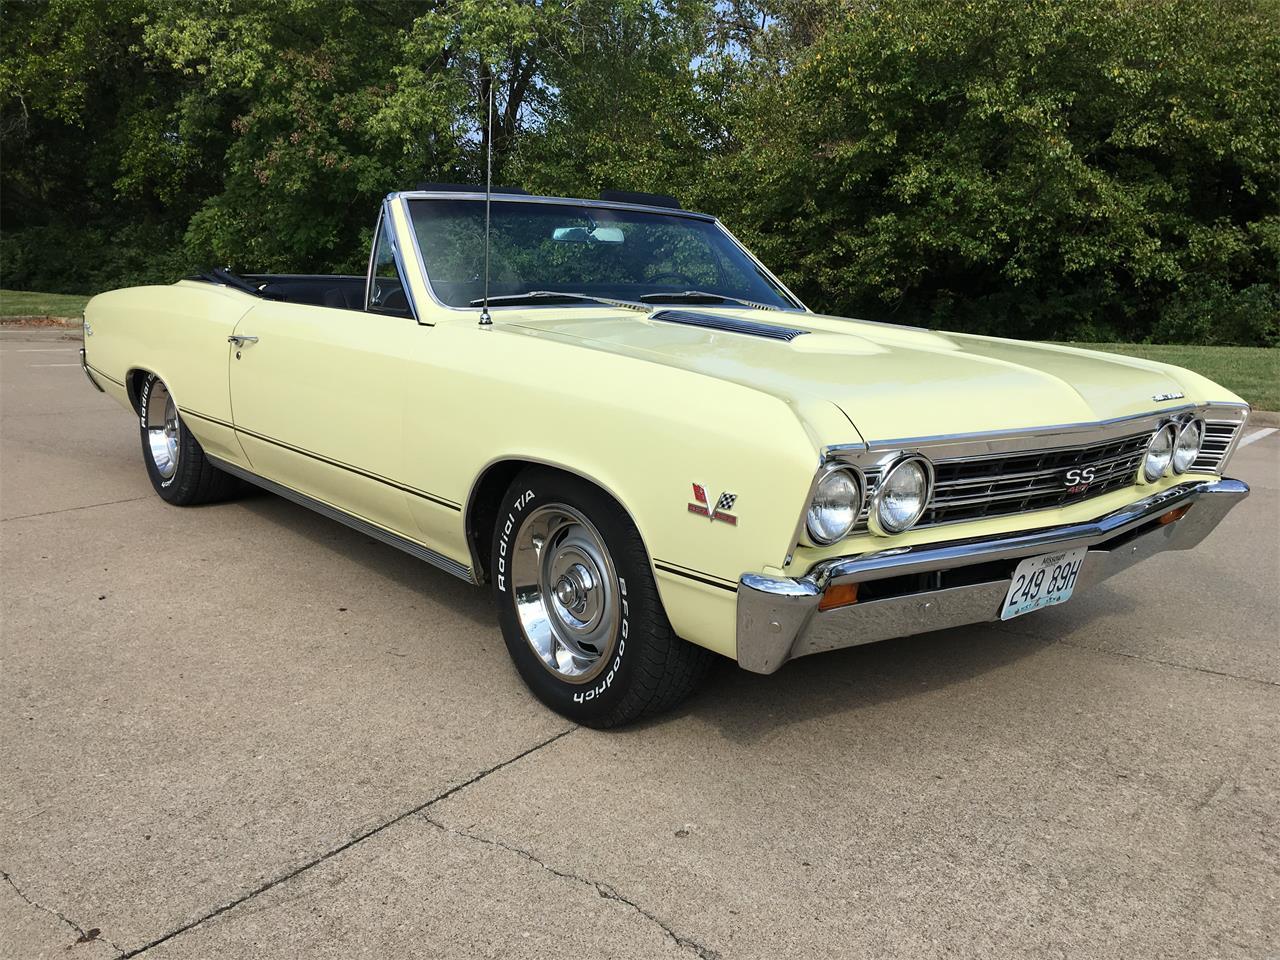 1967 Chevrolet Chevelle SS for Sale | ClassicCars.com | CC-1026920